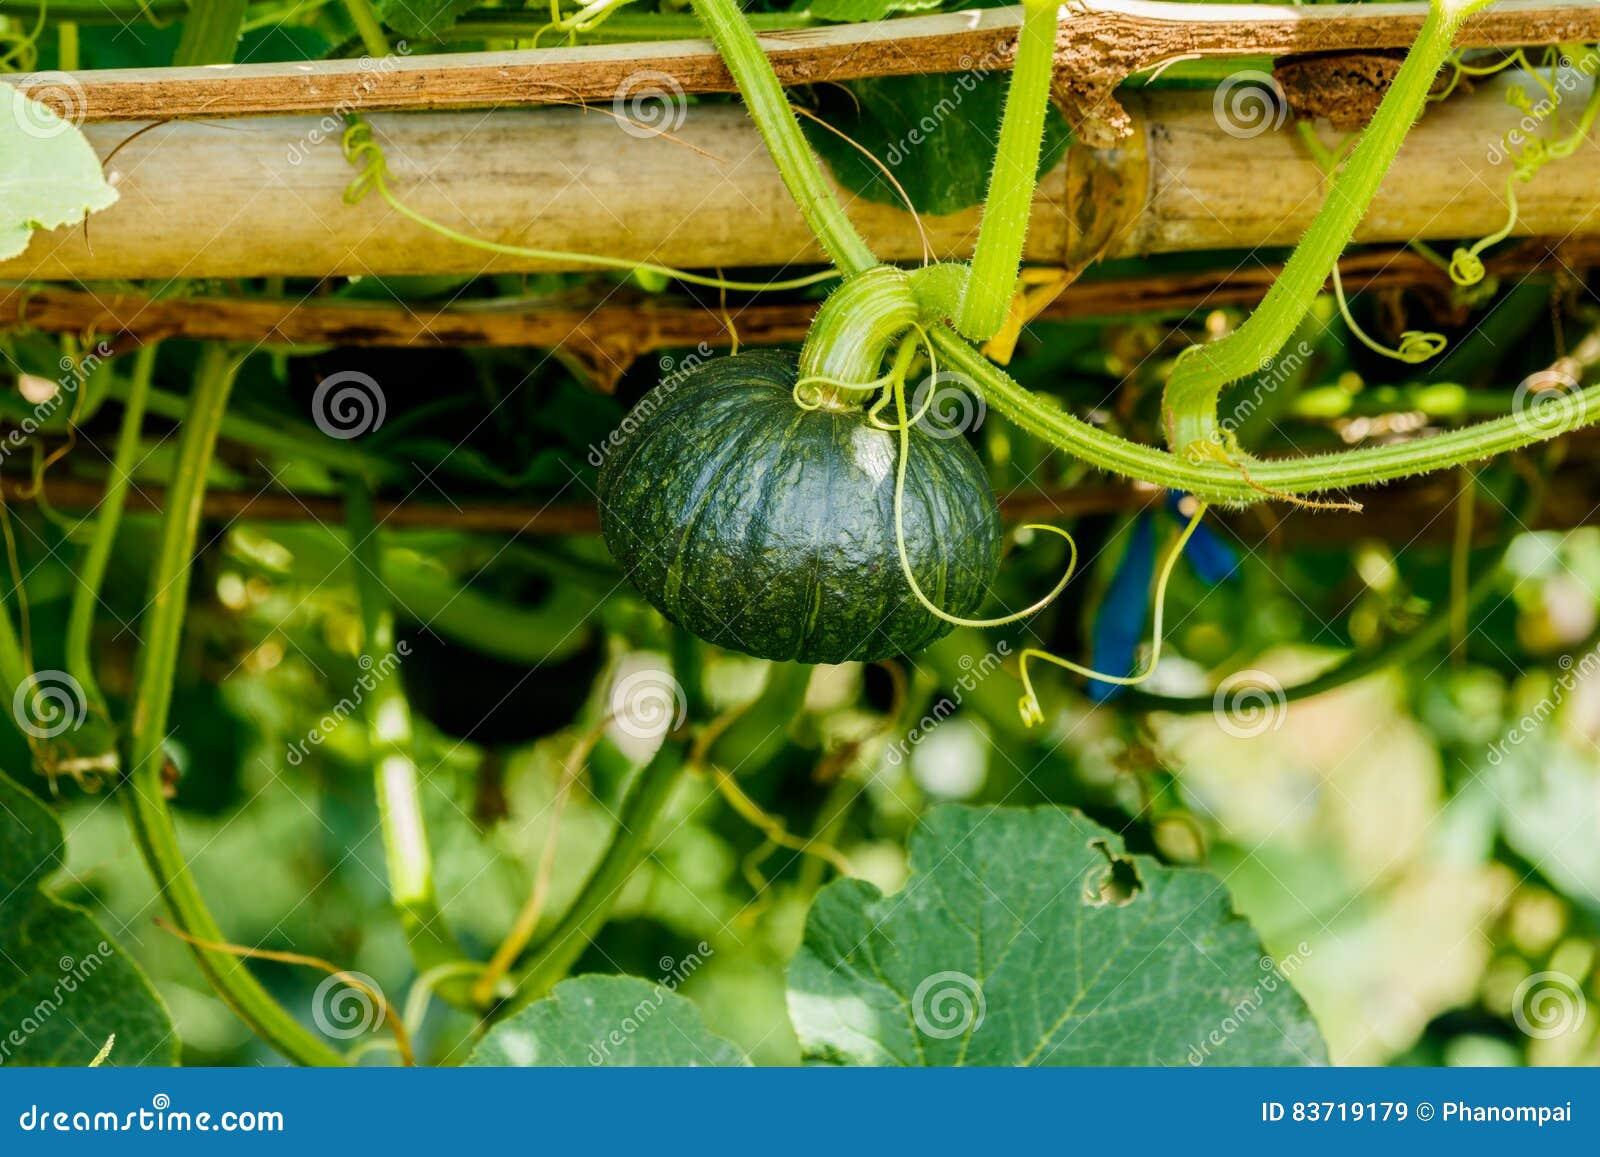 Winter Squash, Or Pumpkin On Its Tree. Stock Photo